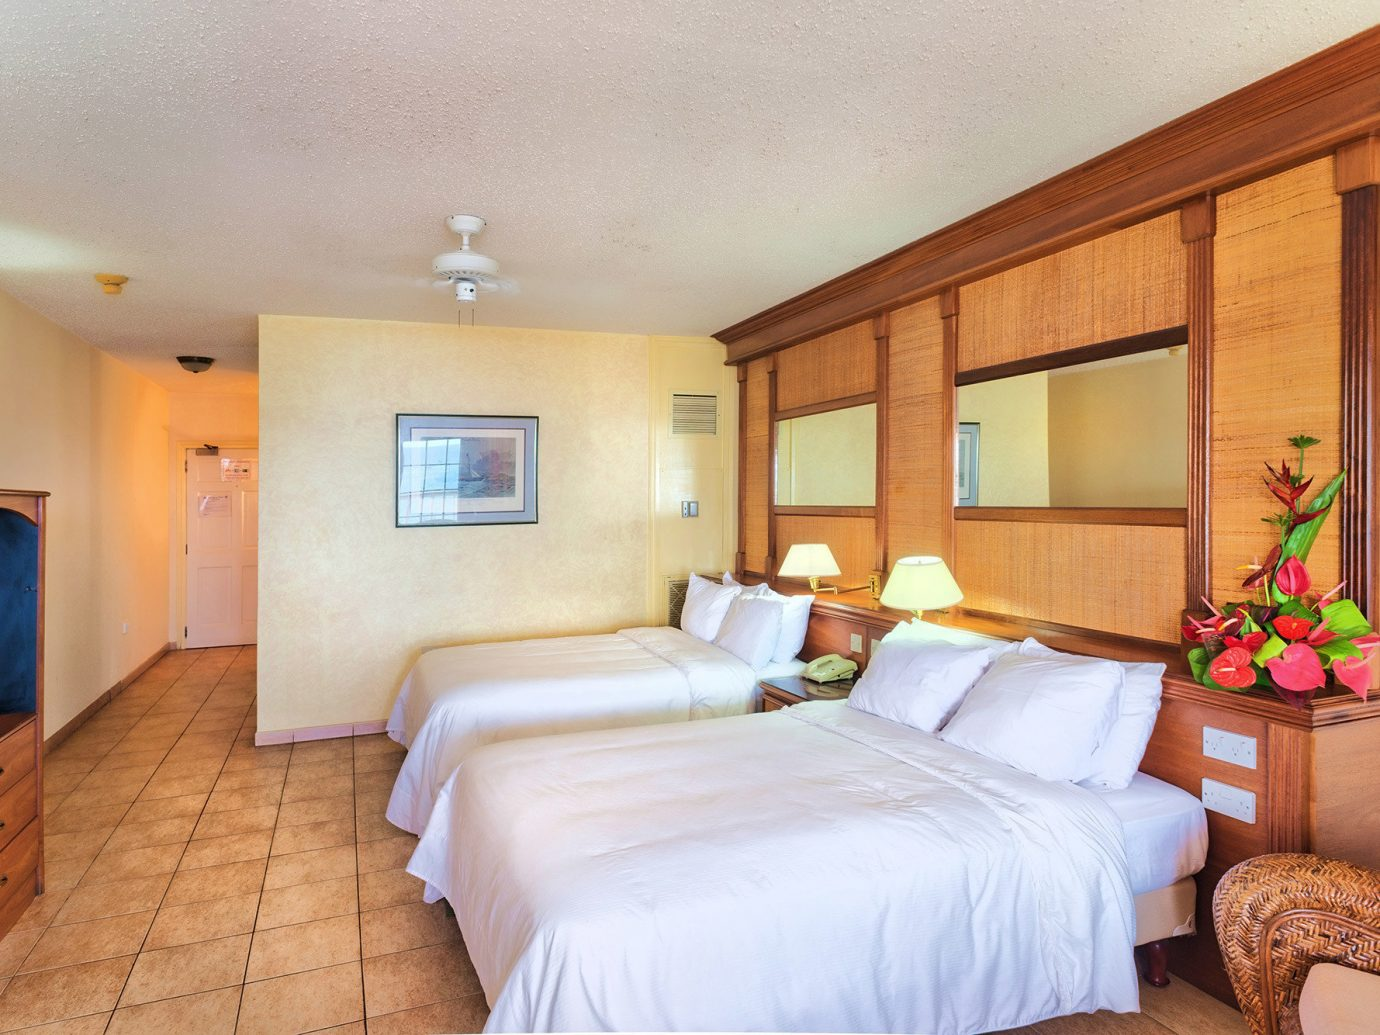 Trip Ideas indoor bed wall floor ceiling room property Bedroom Suite hotel estate real estate cottage Villa interior design living room apartment furniture